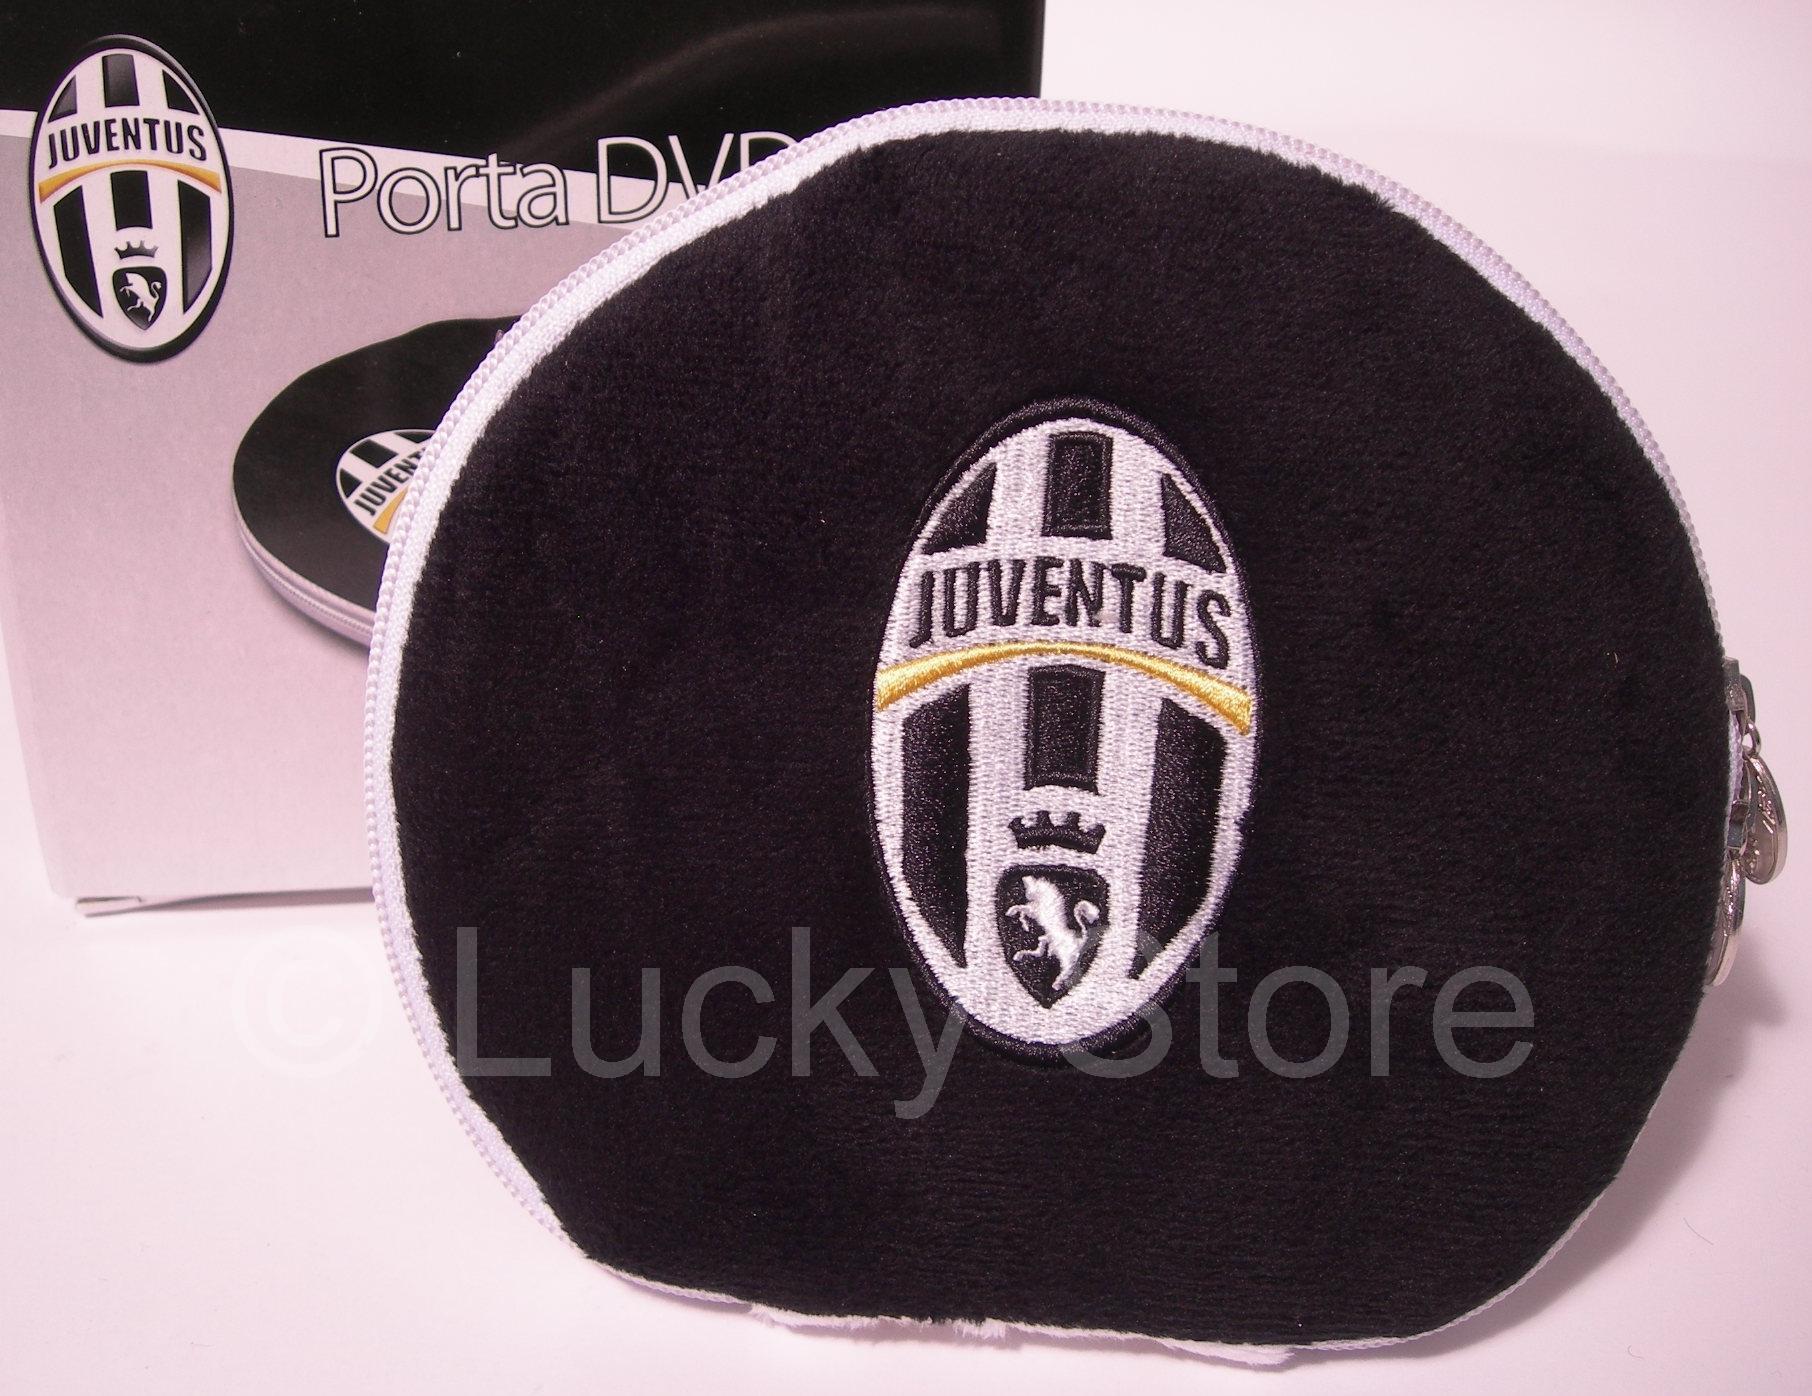 Juventus Porta CD DVD Ufficiale